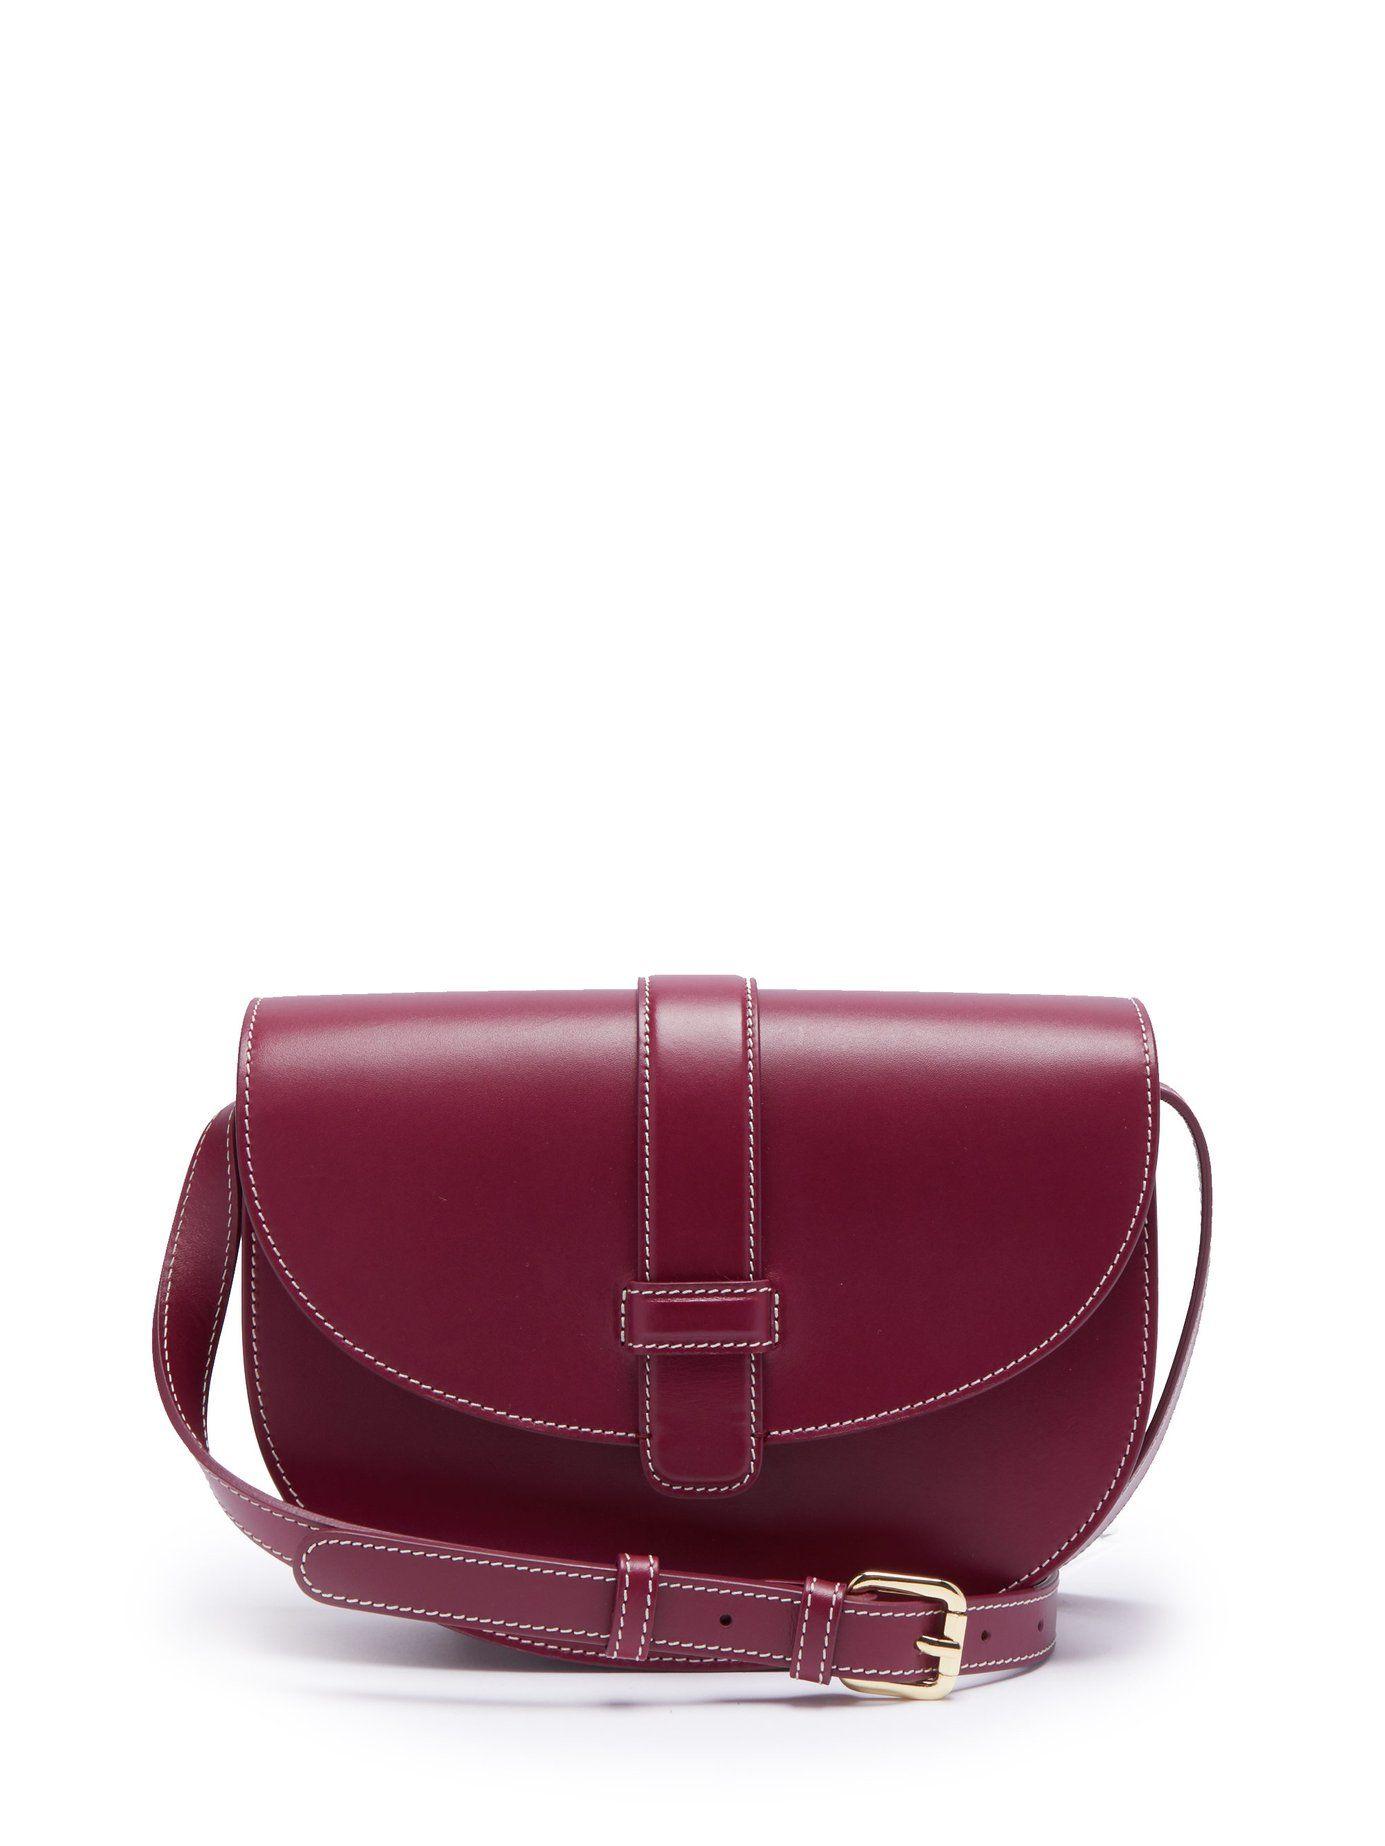 8cb13fedec Eloise leather saddle bag